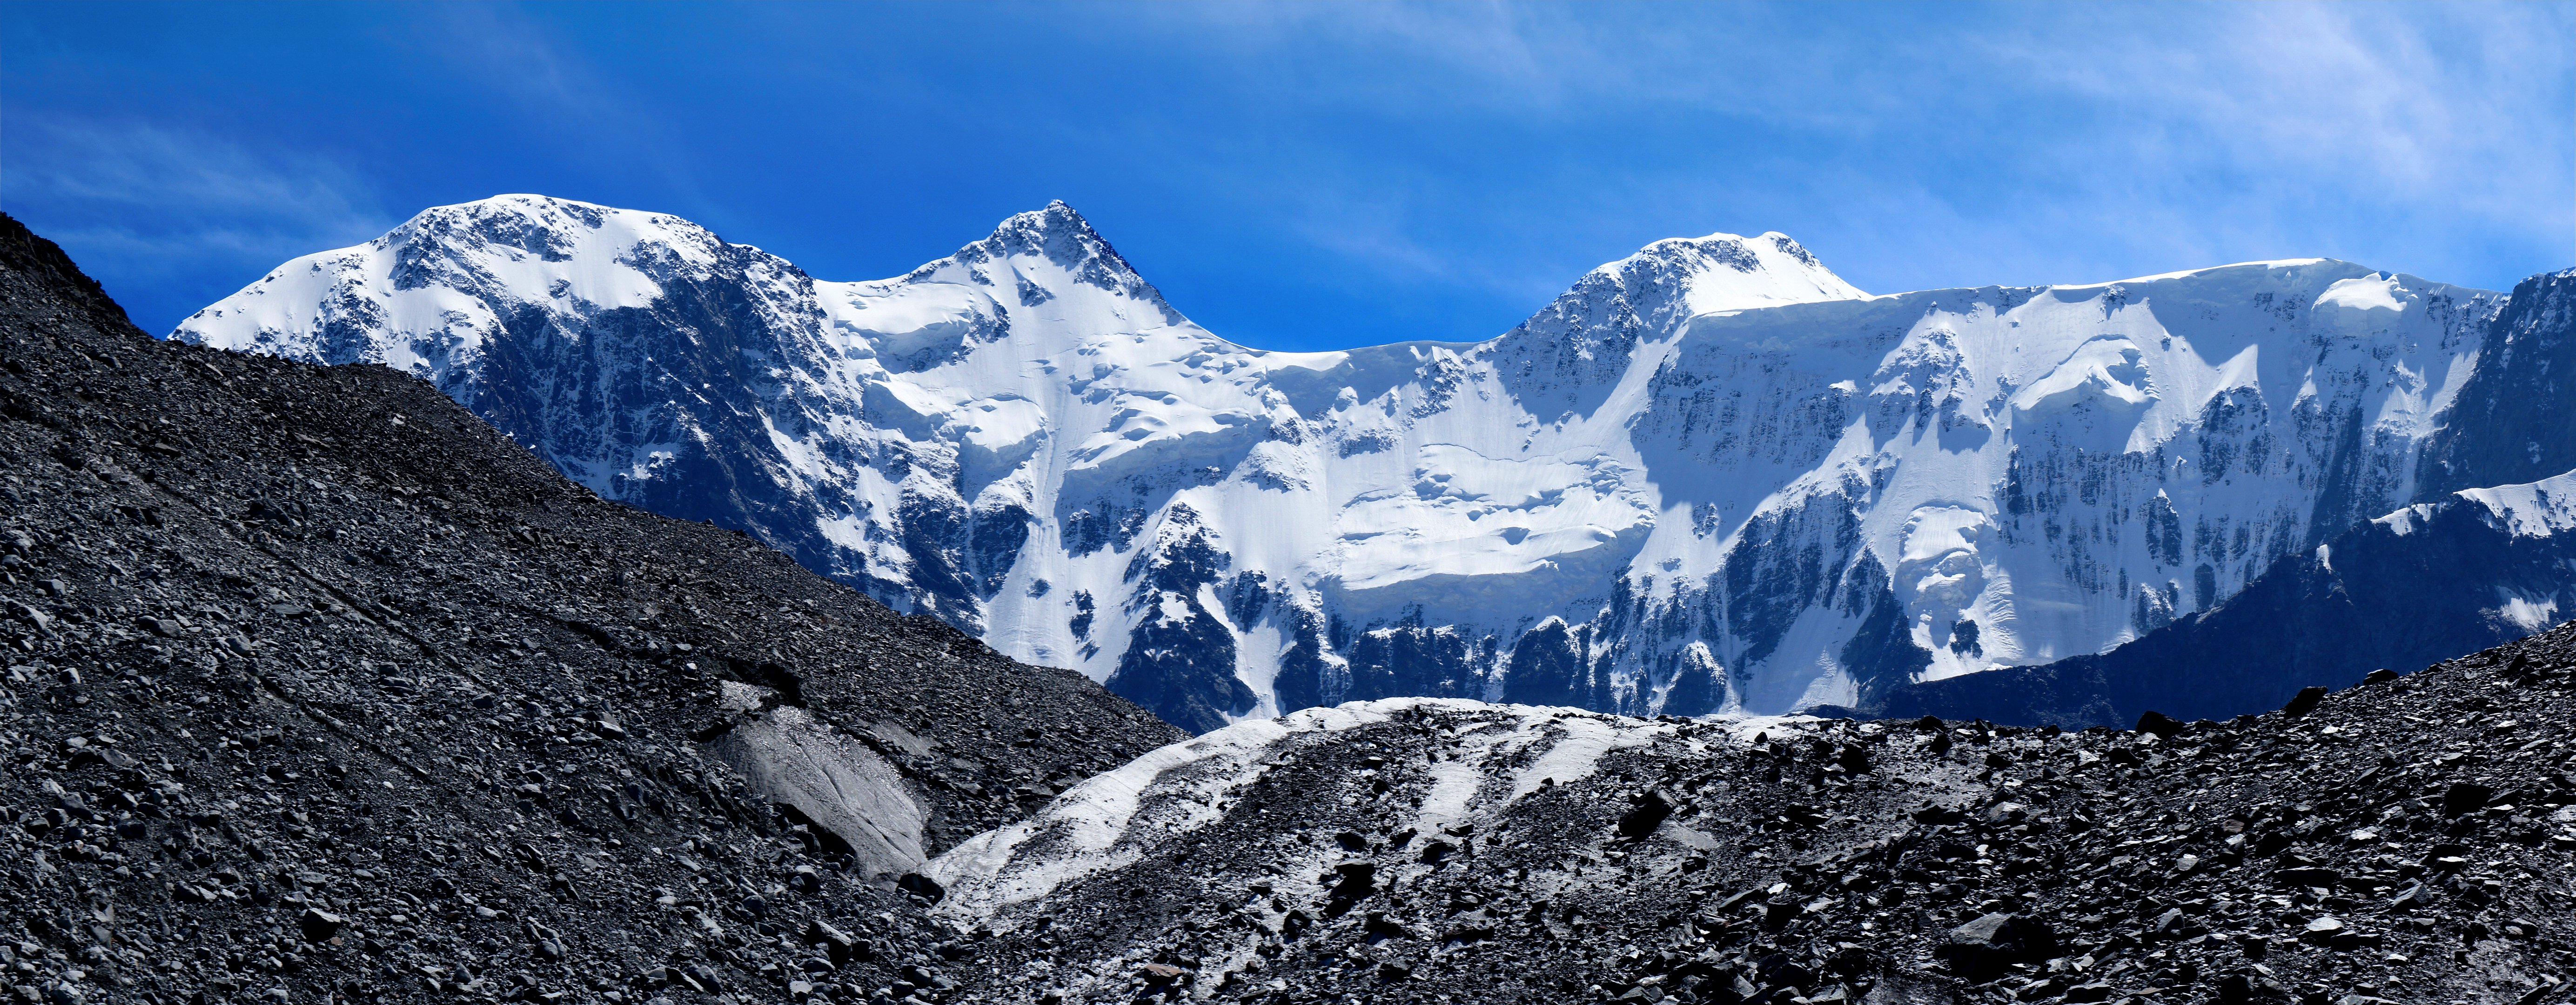 Panorama Dual Monitor Mountain Snow Wallpaper 5536x2160